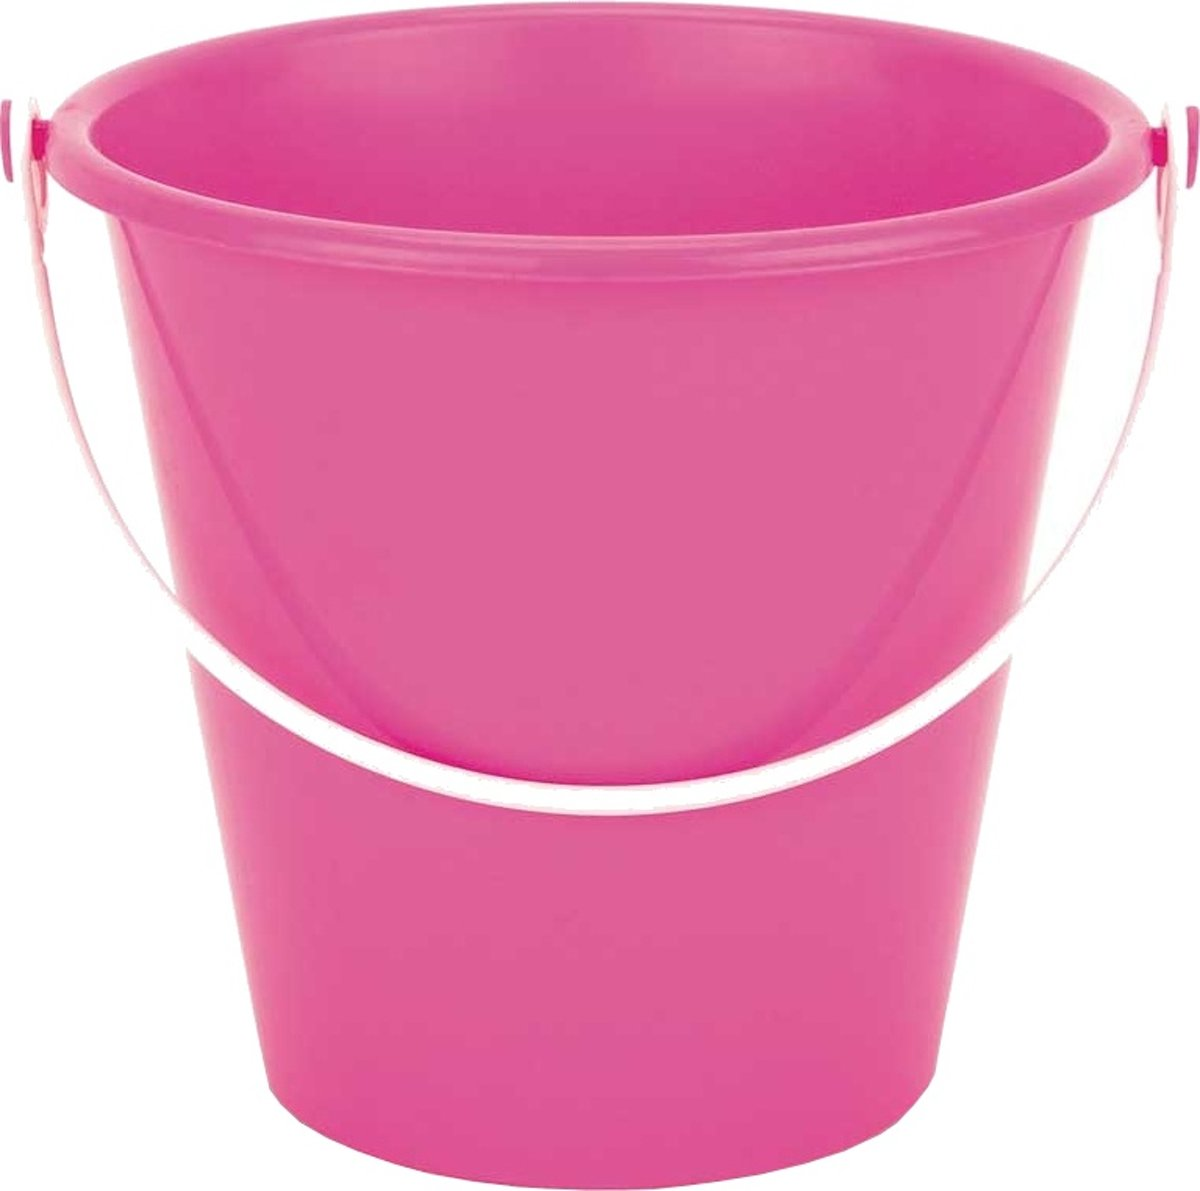 Yello Emmer Roze 19 X 18 Cm kopen